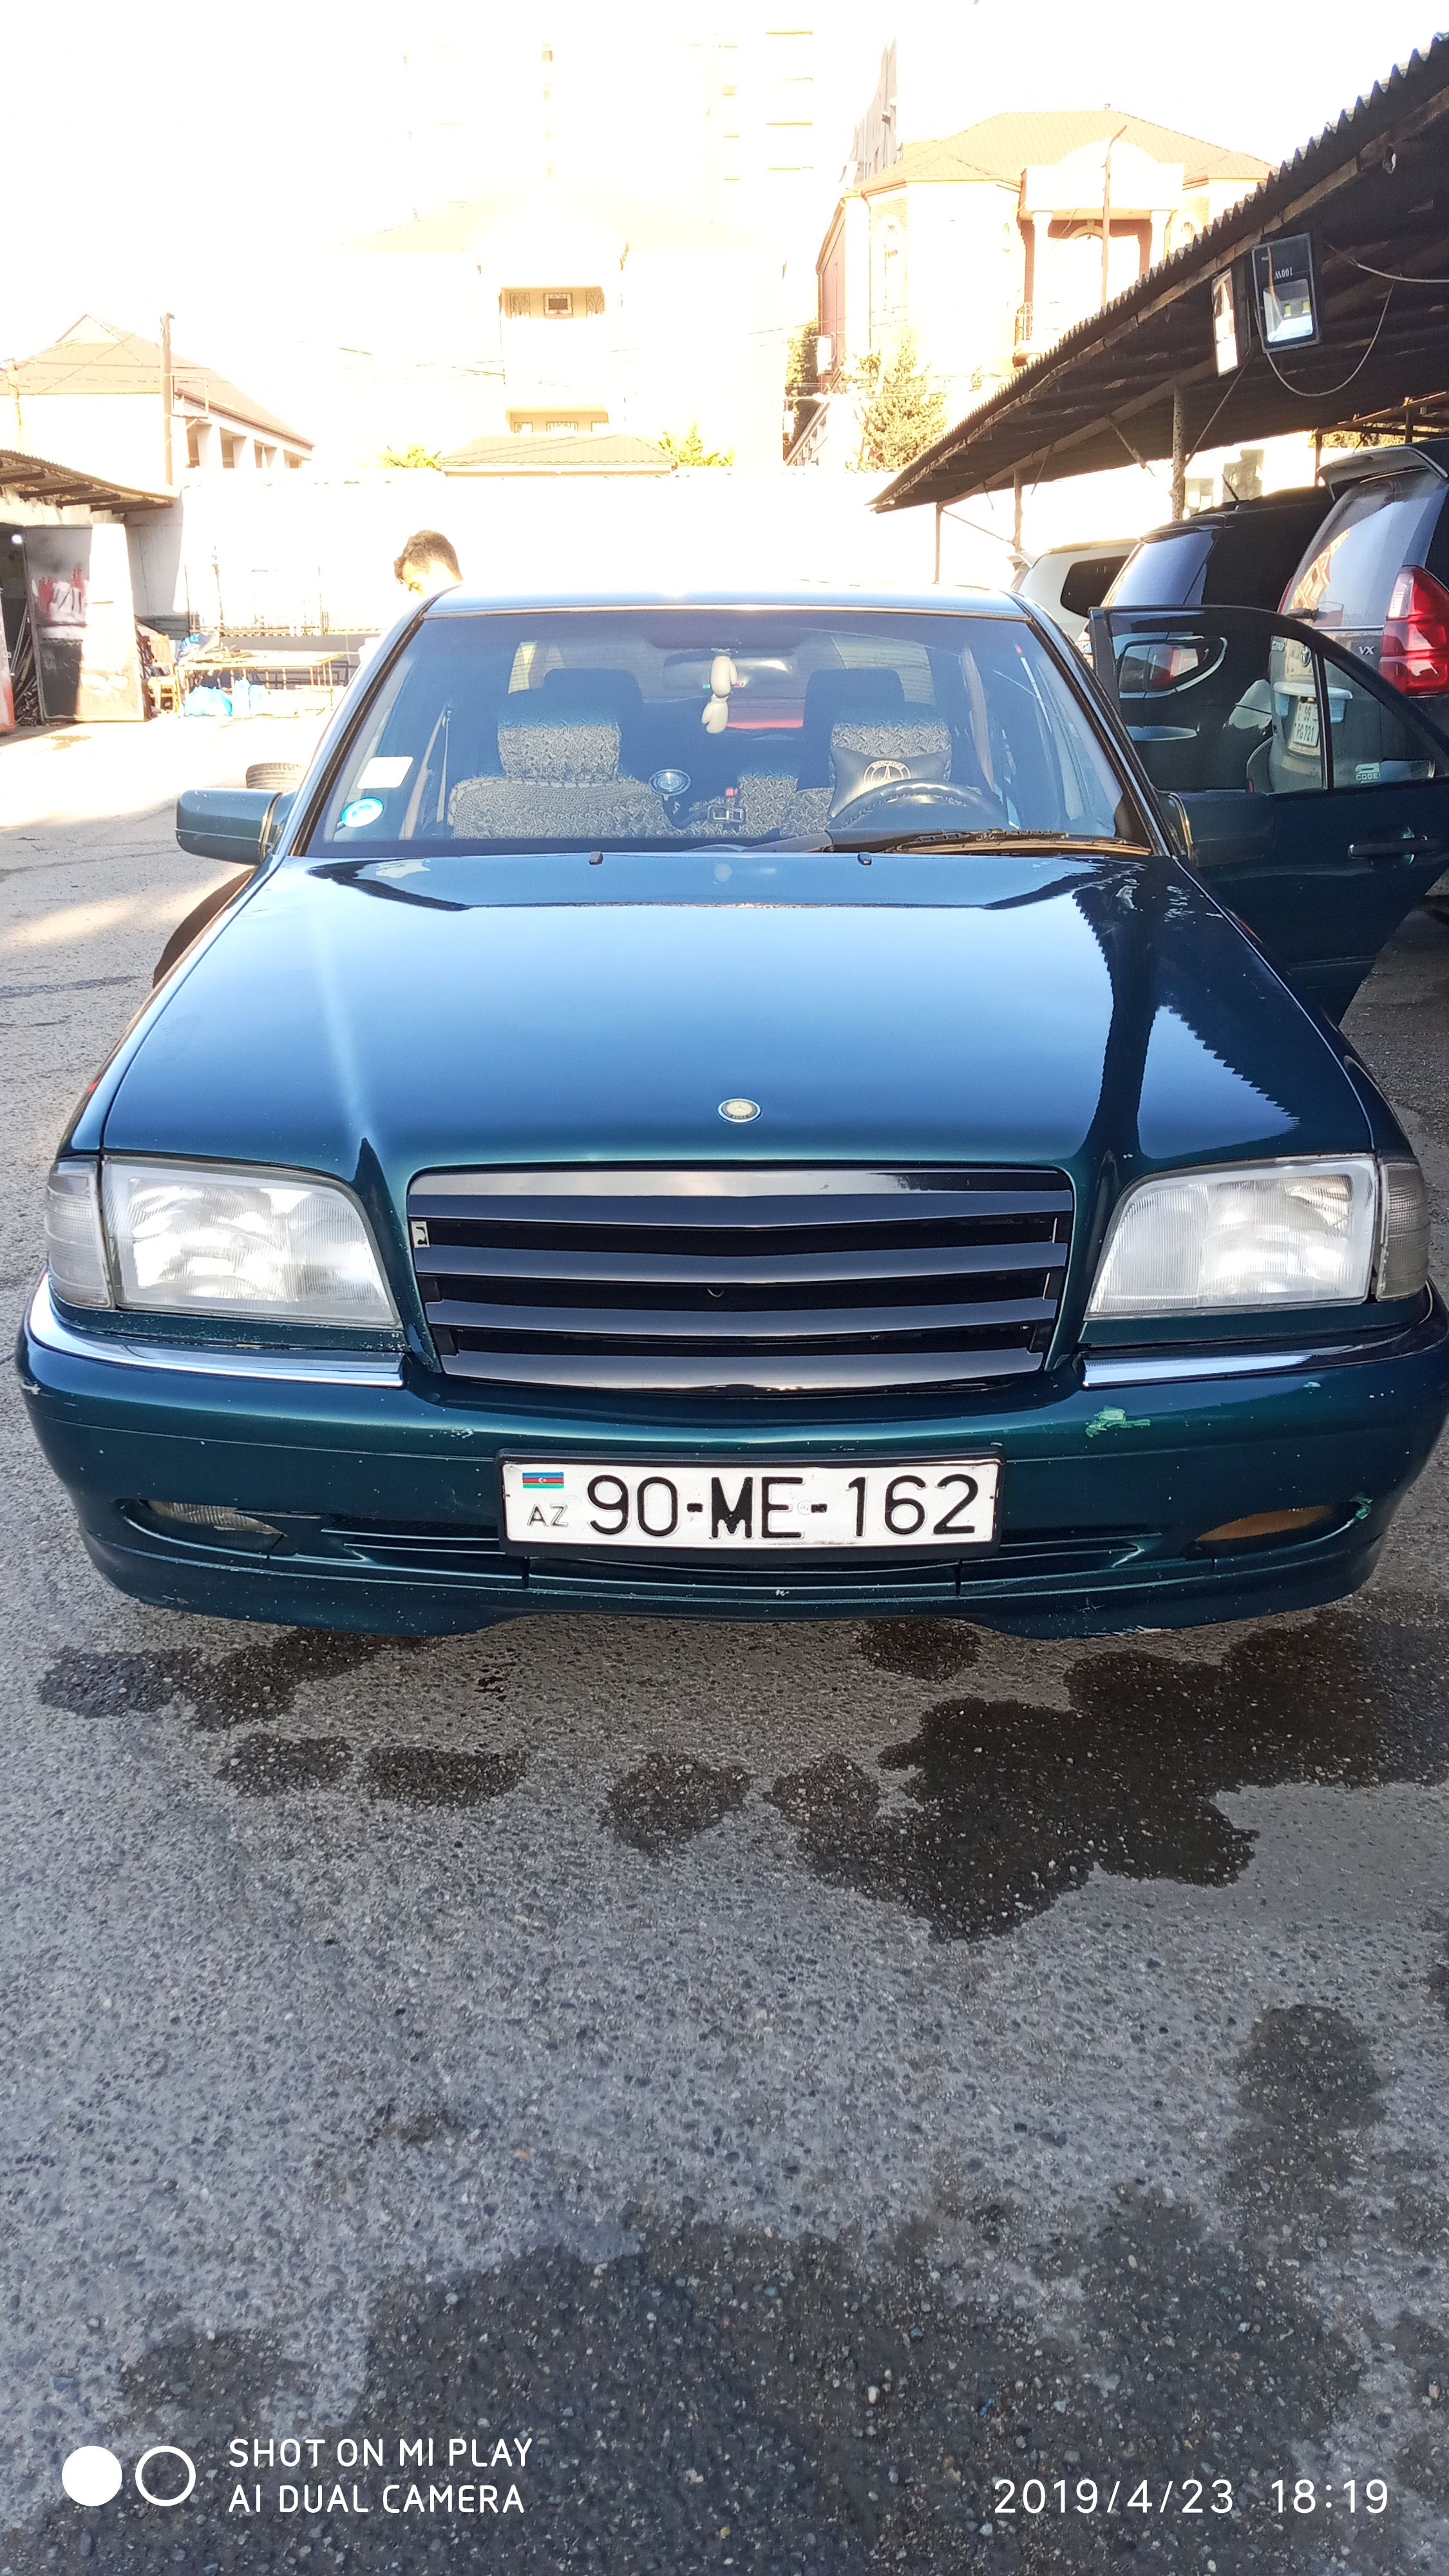 Mercedes-Benz C 180 1.8(lt) 1995 İkinci əl  $7600